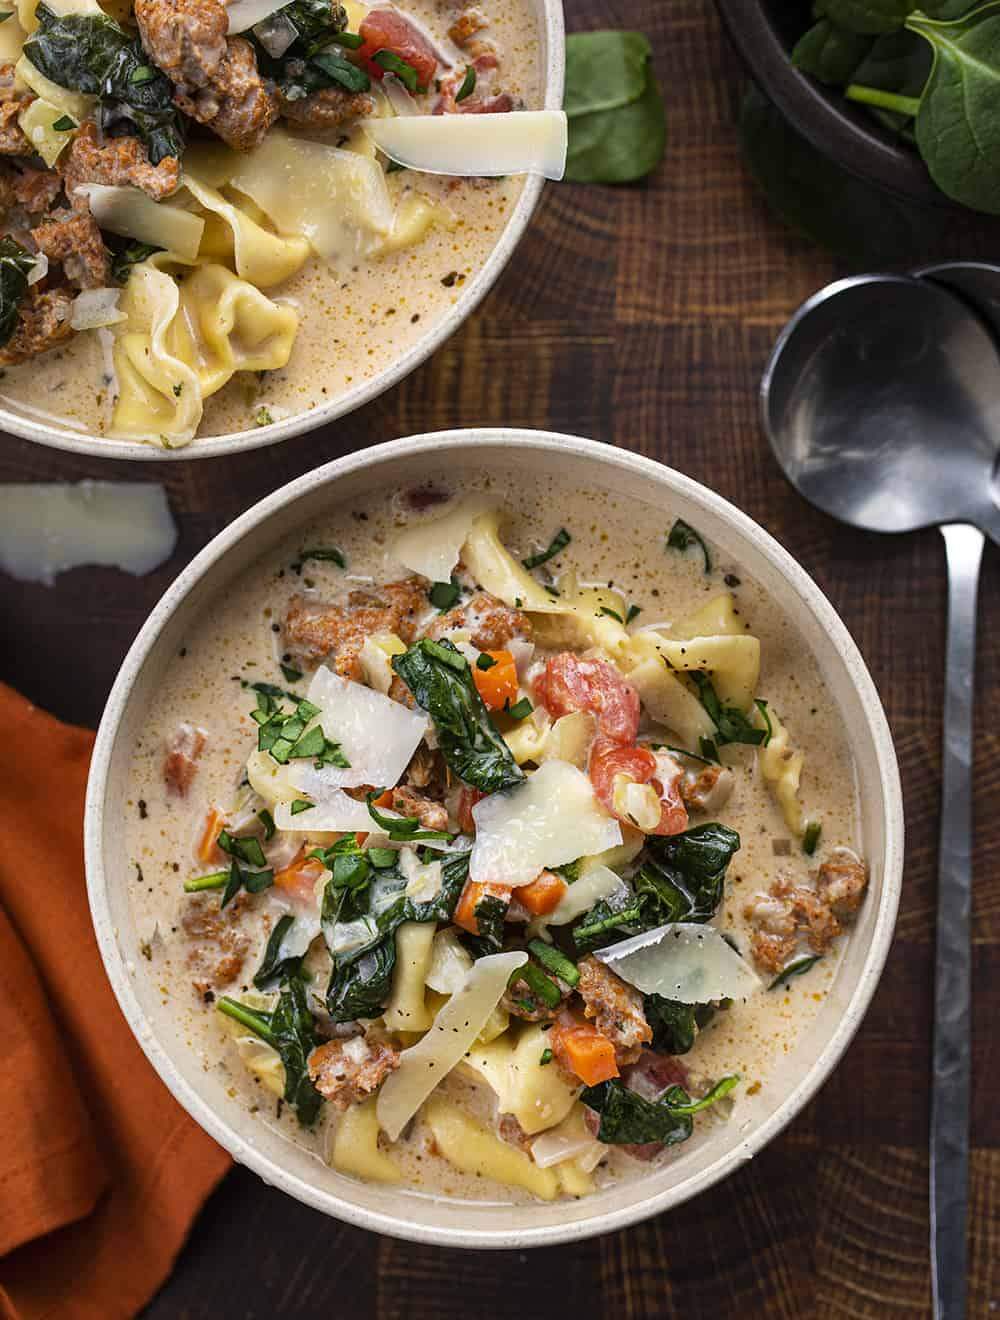 Overhead of bowls of Crockpot Sausage Tortellini Soup